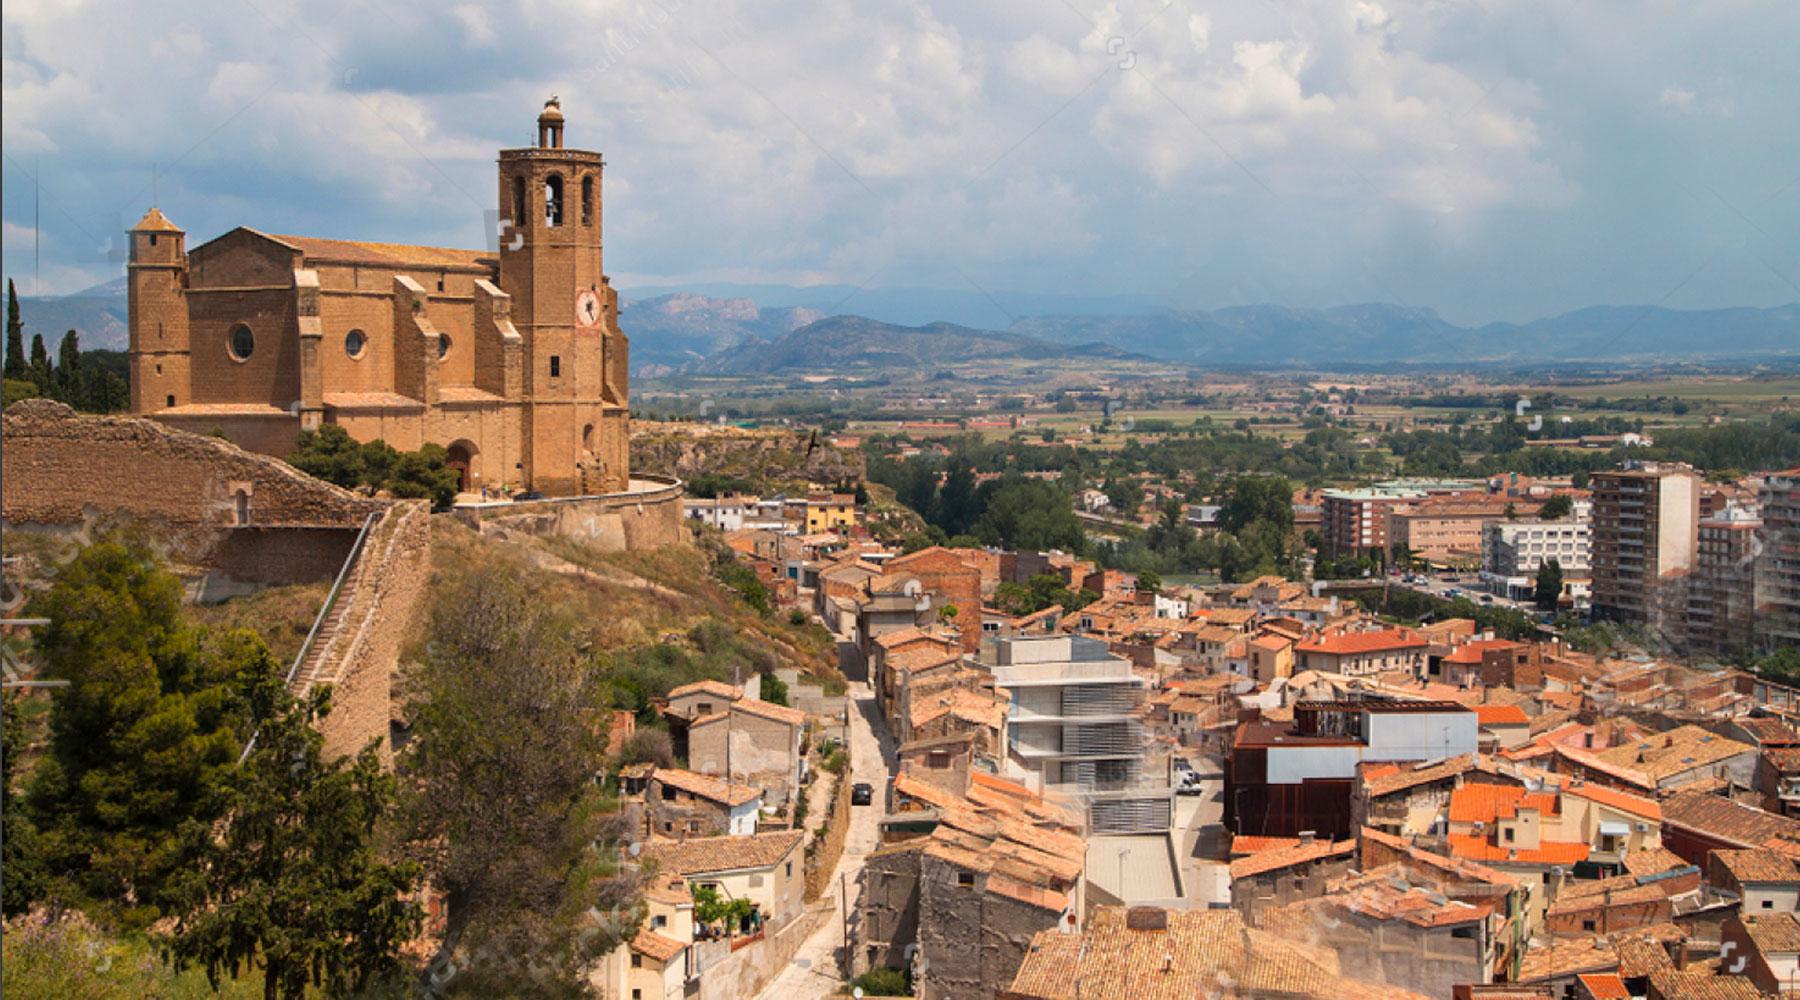 City Of Balaguer. Lo Palauet De La Muralla